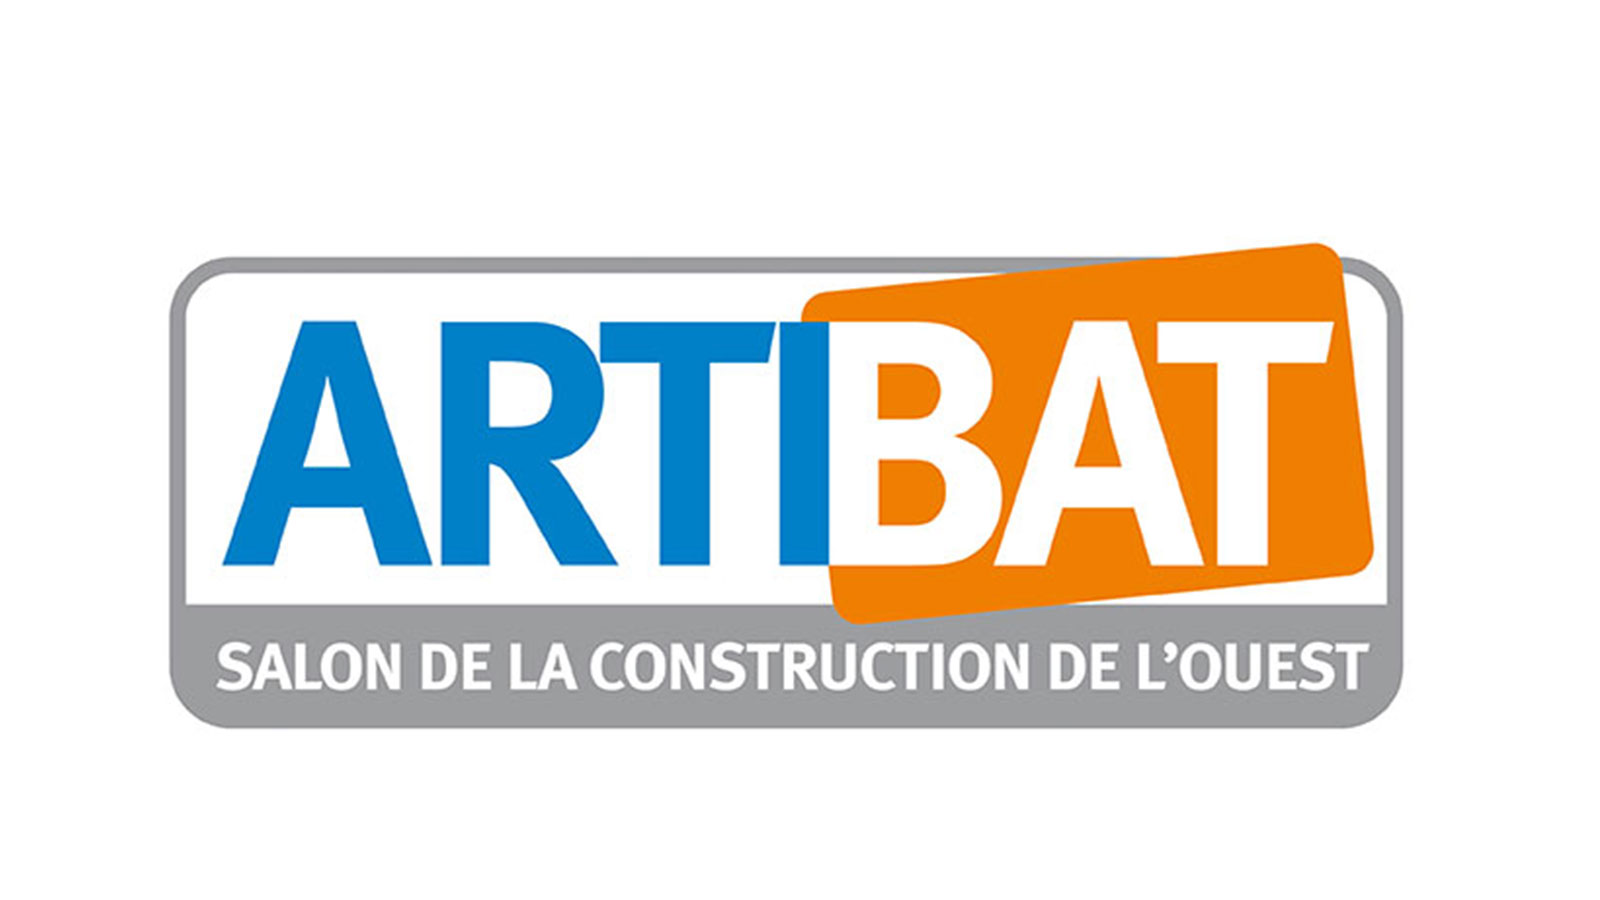 Asite proudly sponsor Artibat Construction Salon in Rennes, France